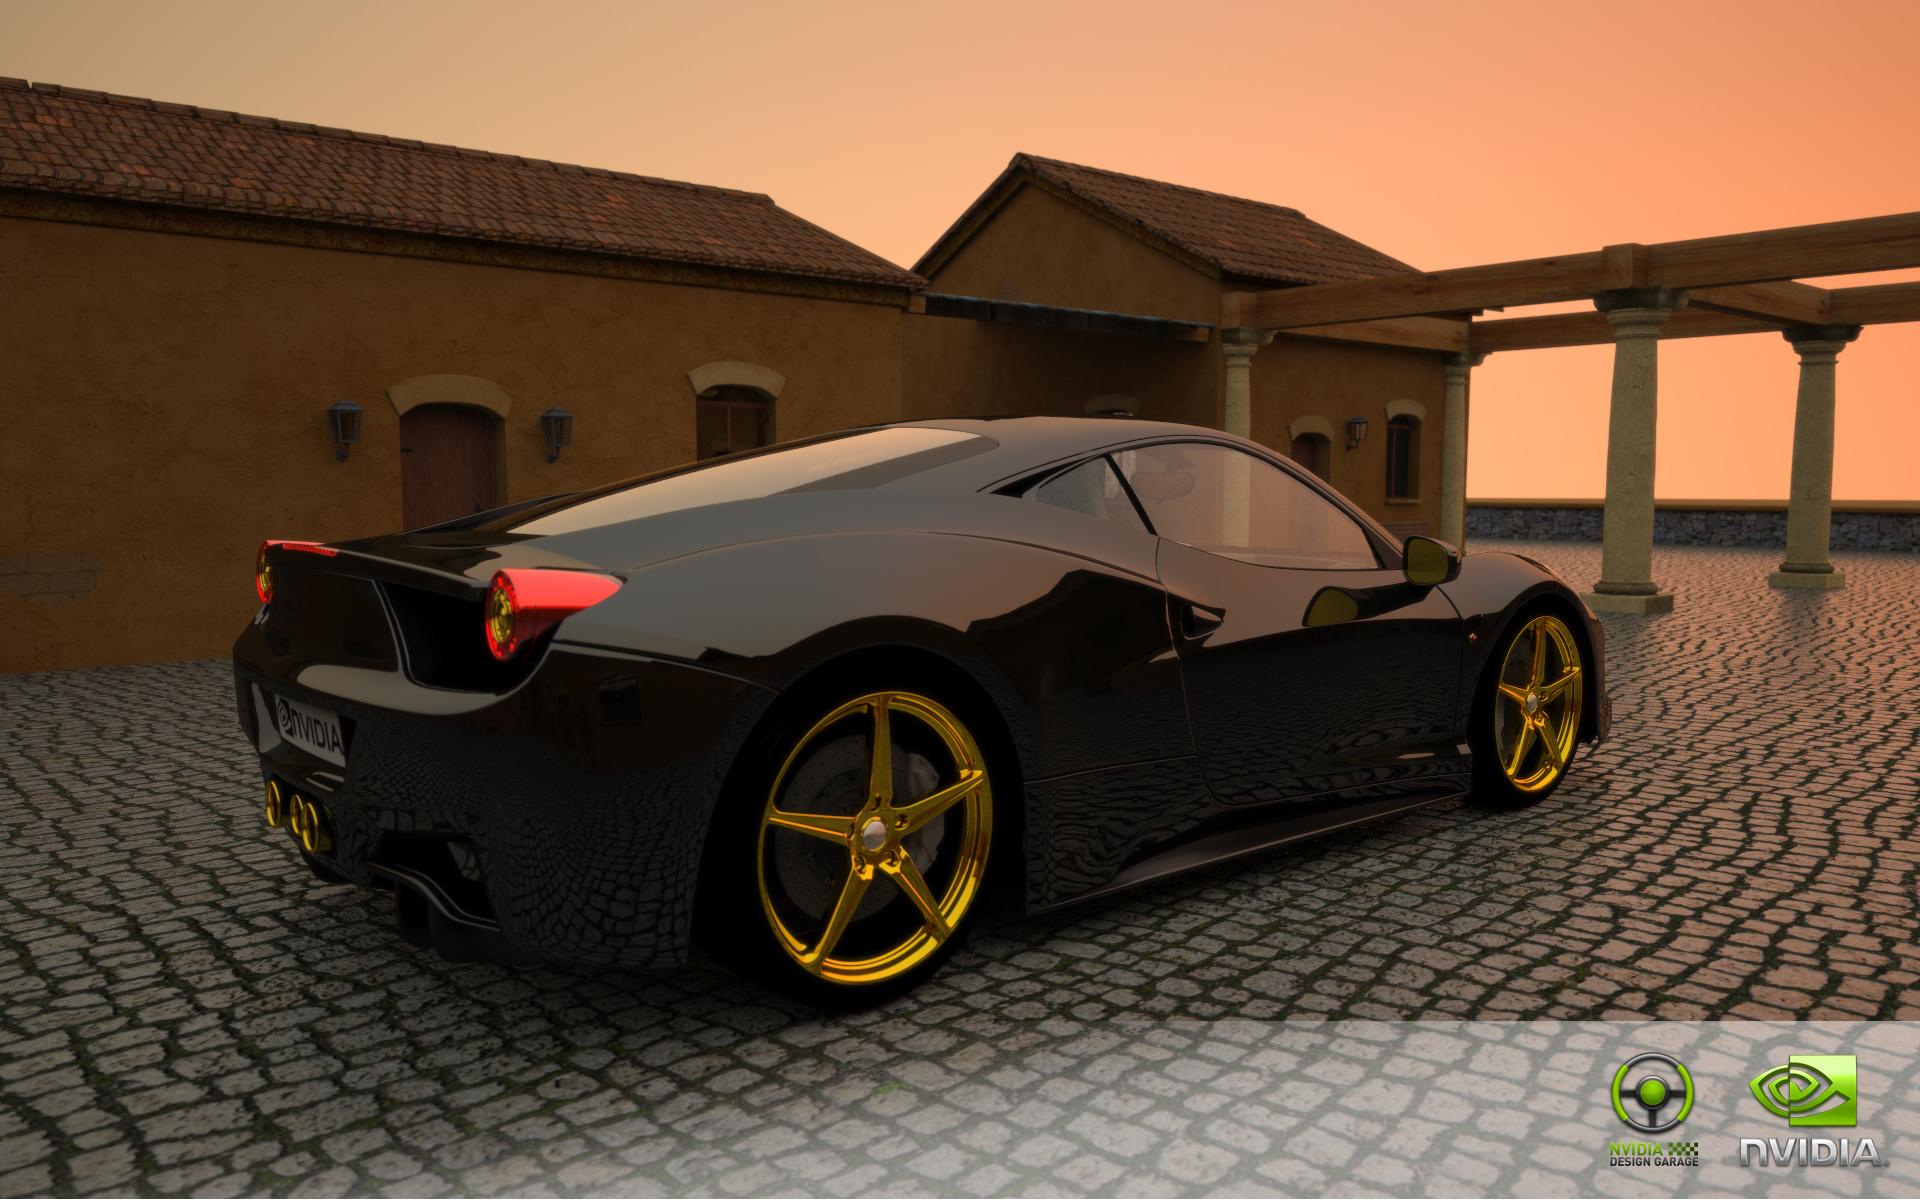 nvidia 1280x800 wallpaper car - photo #10